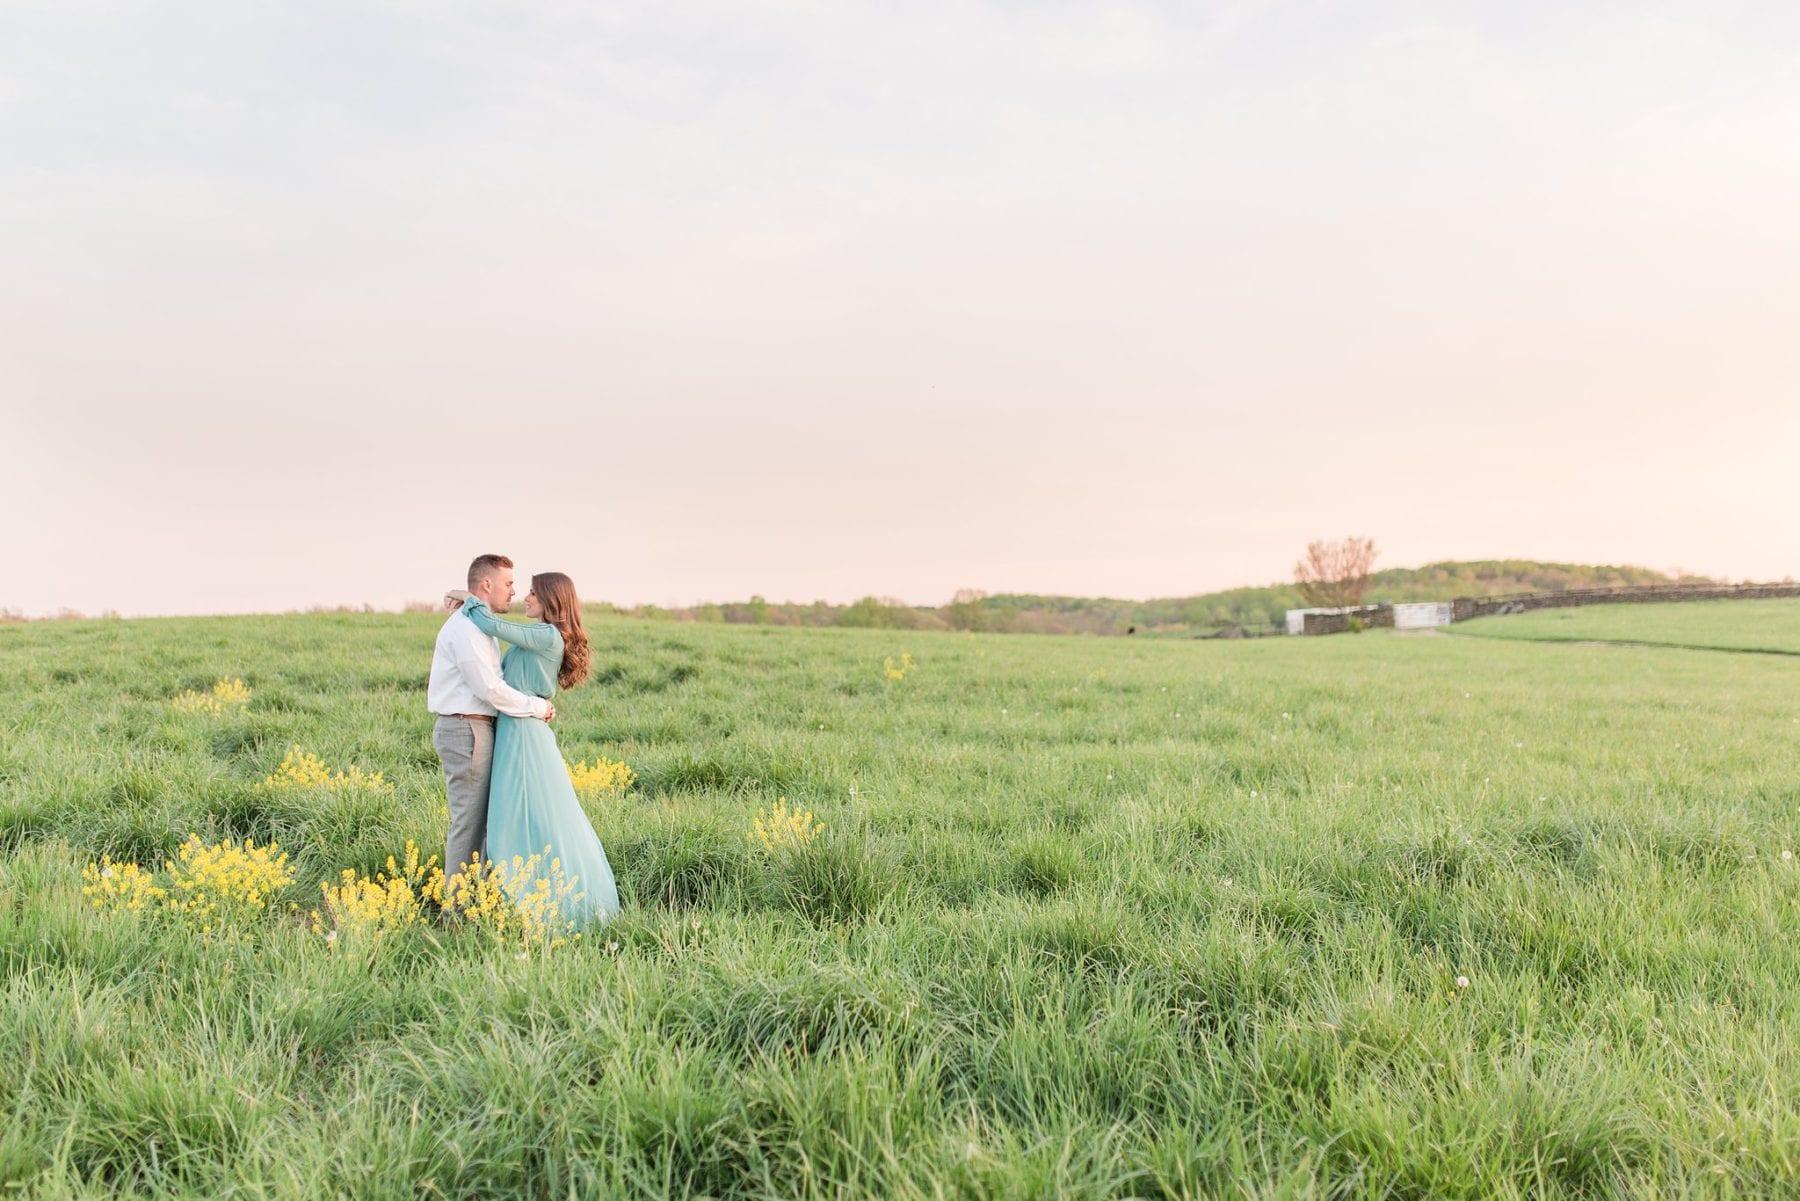 Goodstone Inn Engagement Session Virginia Wedding Photographer Megan Kelsey Photography-333.jpg